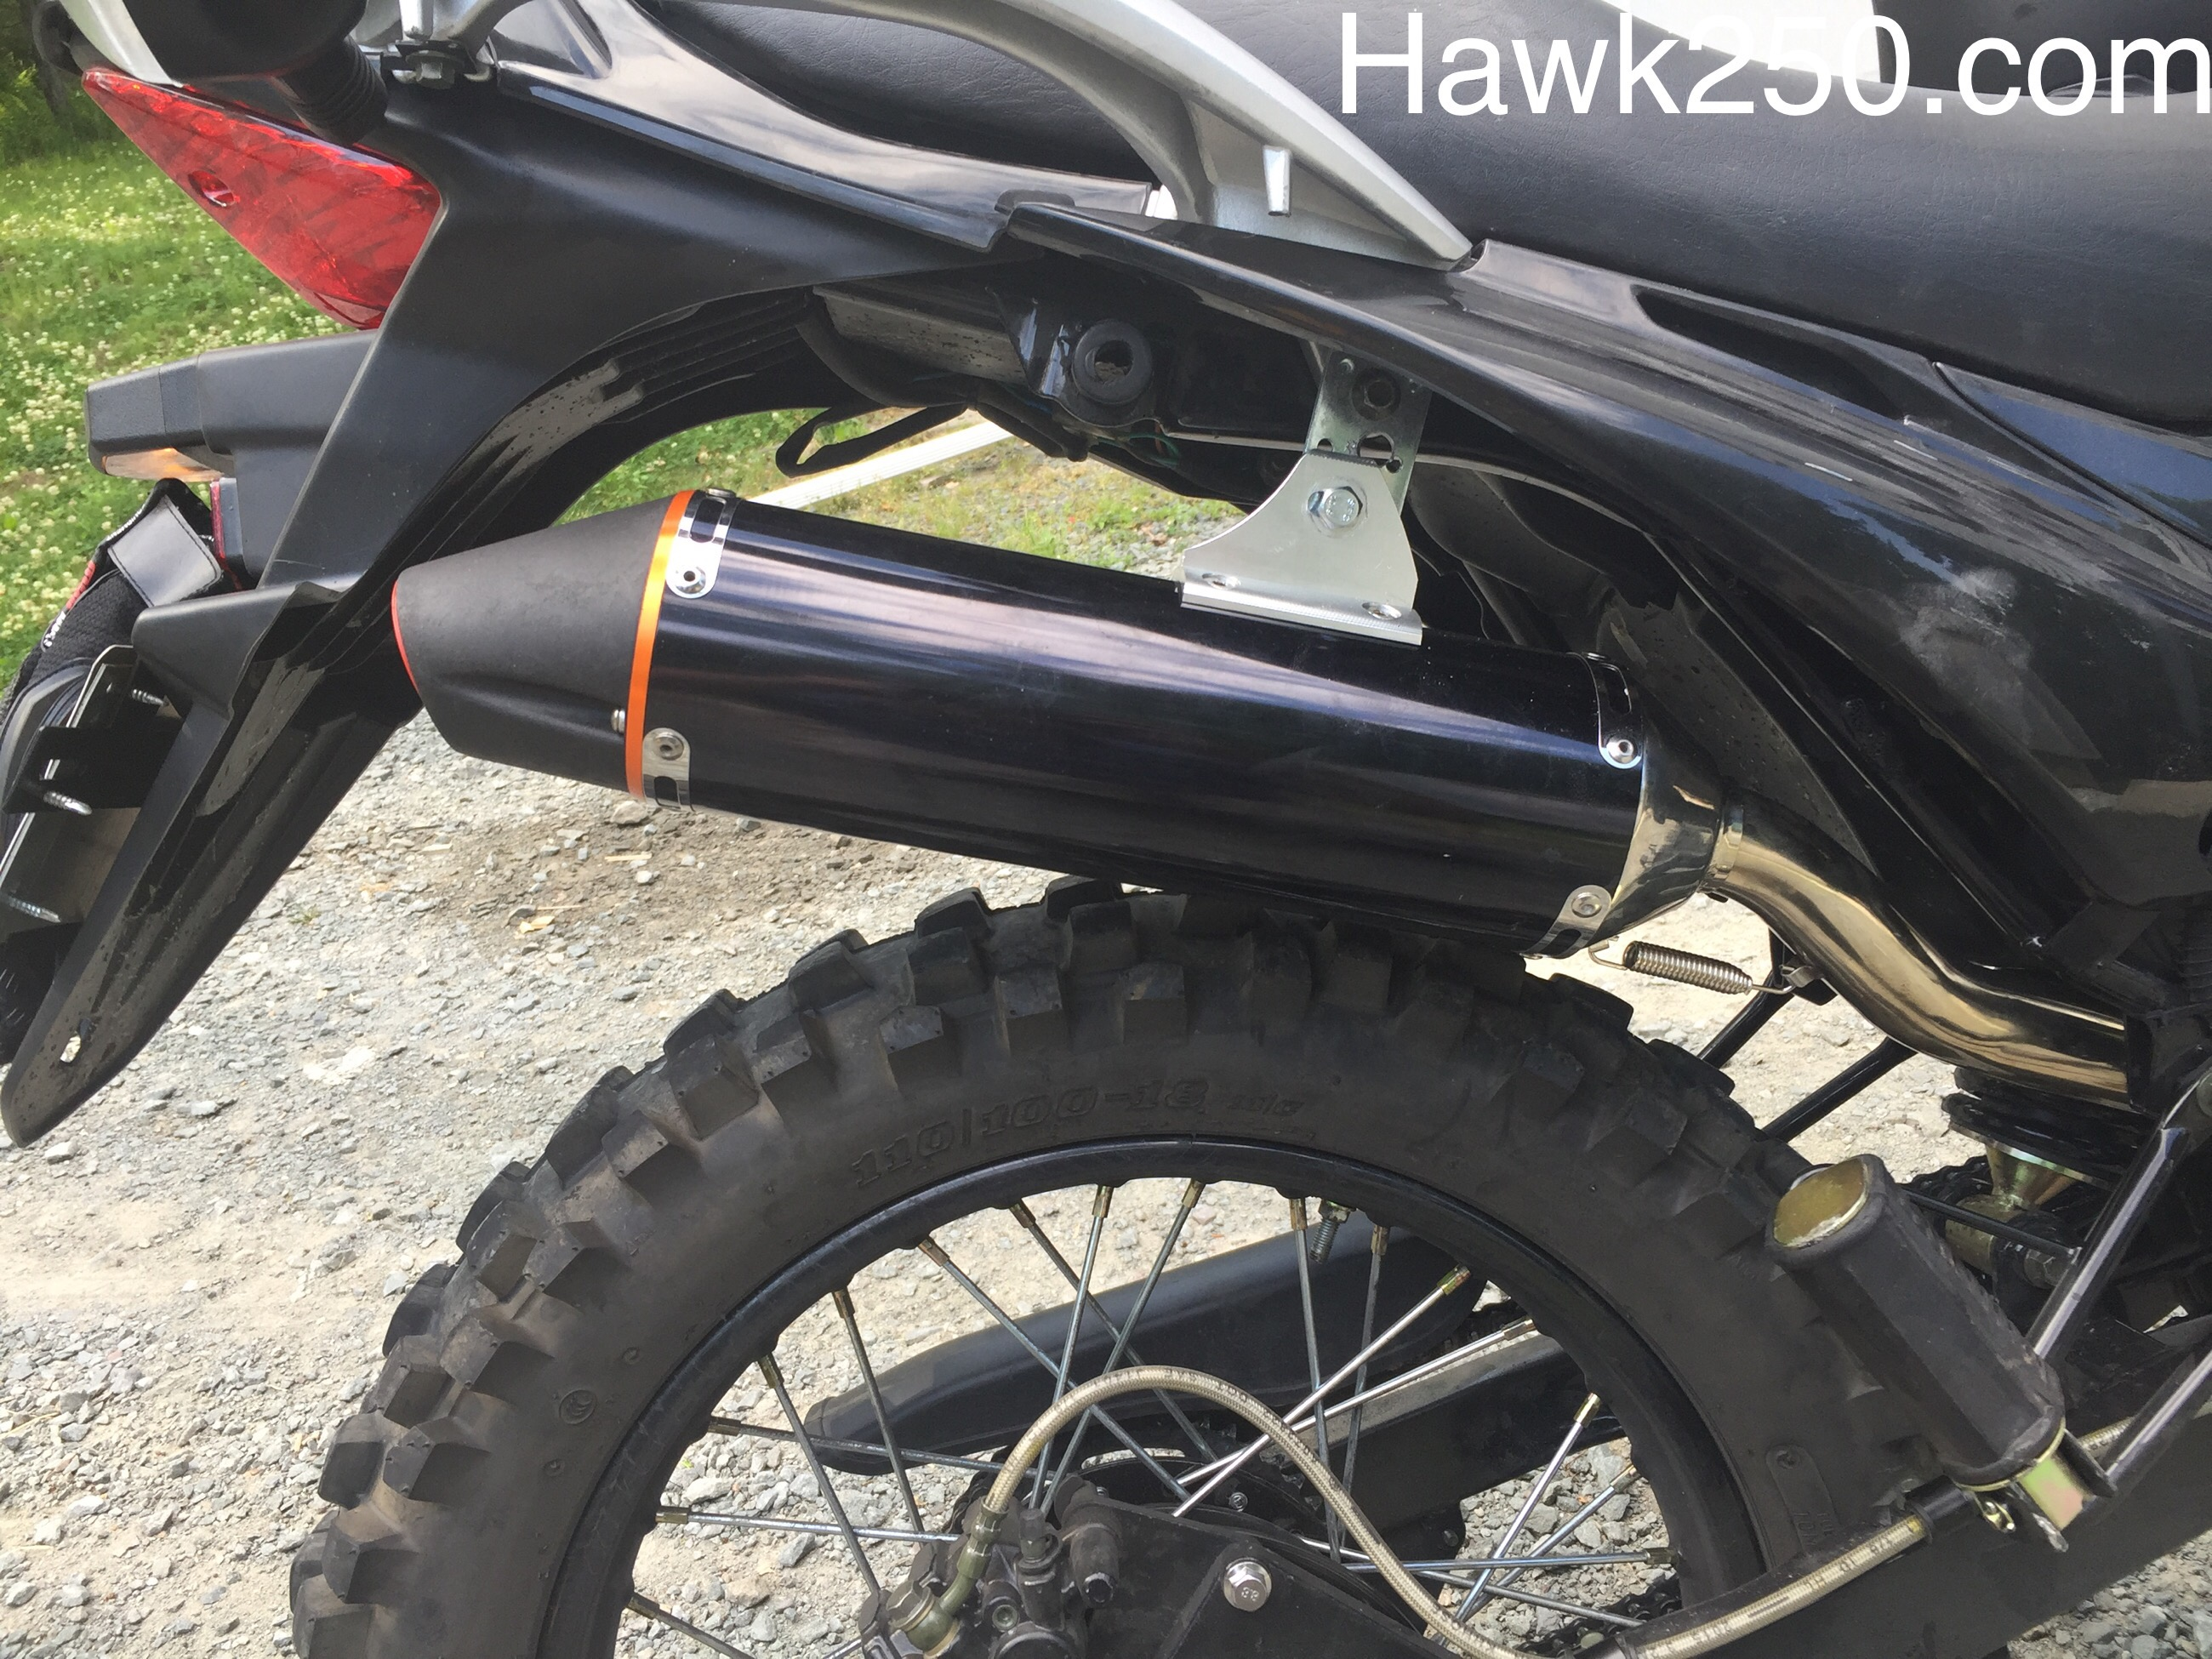 Hawk 250 Aftermarket Exhaust